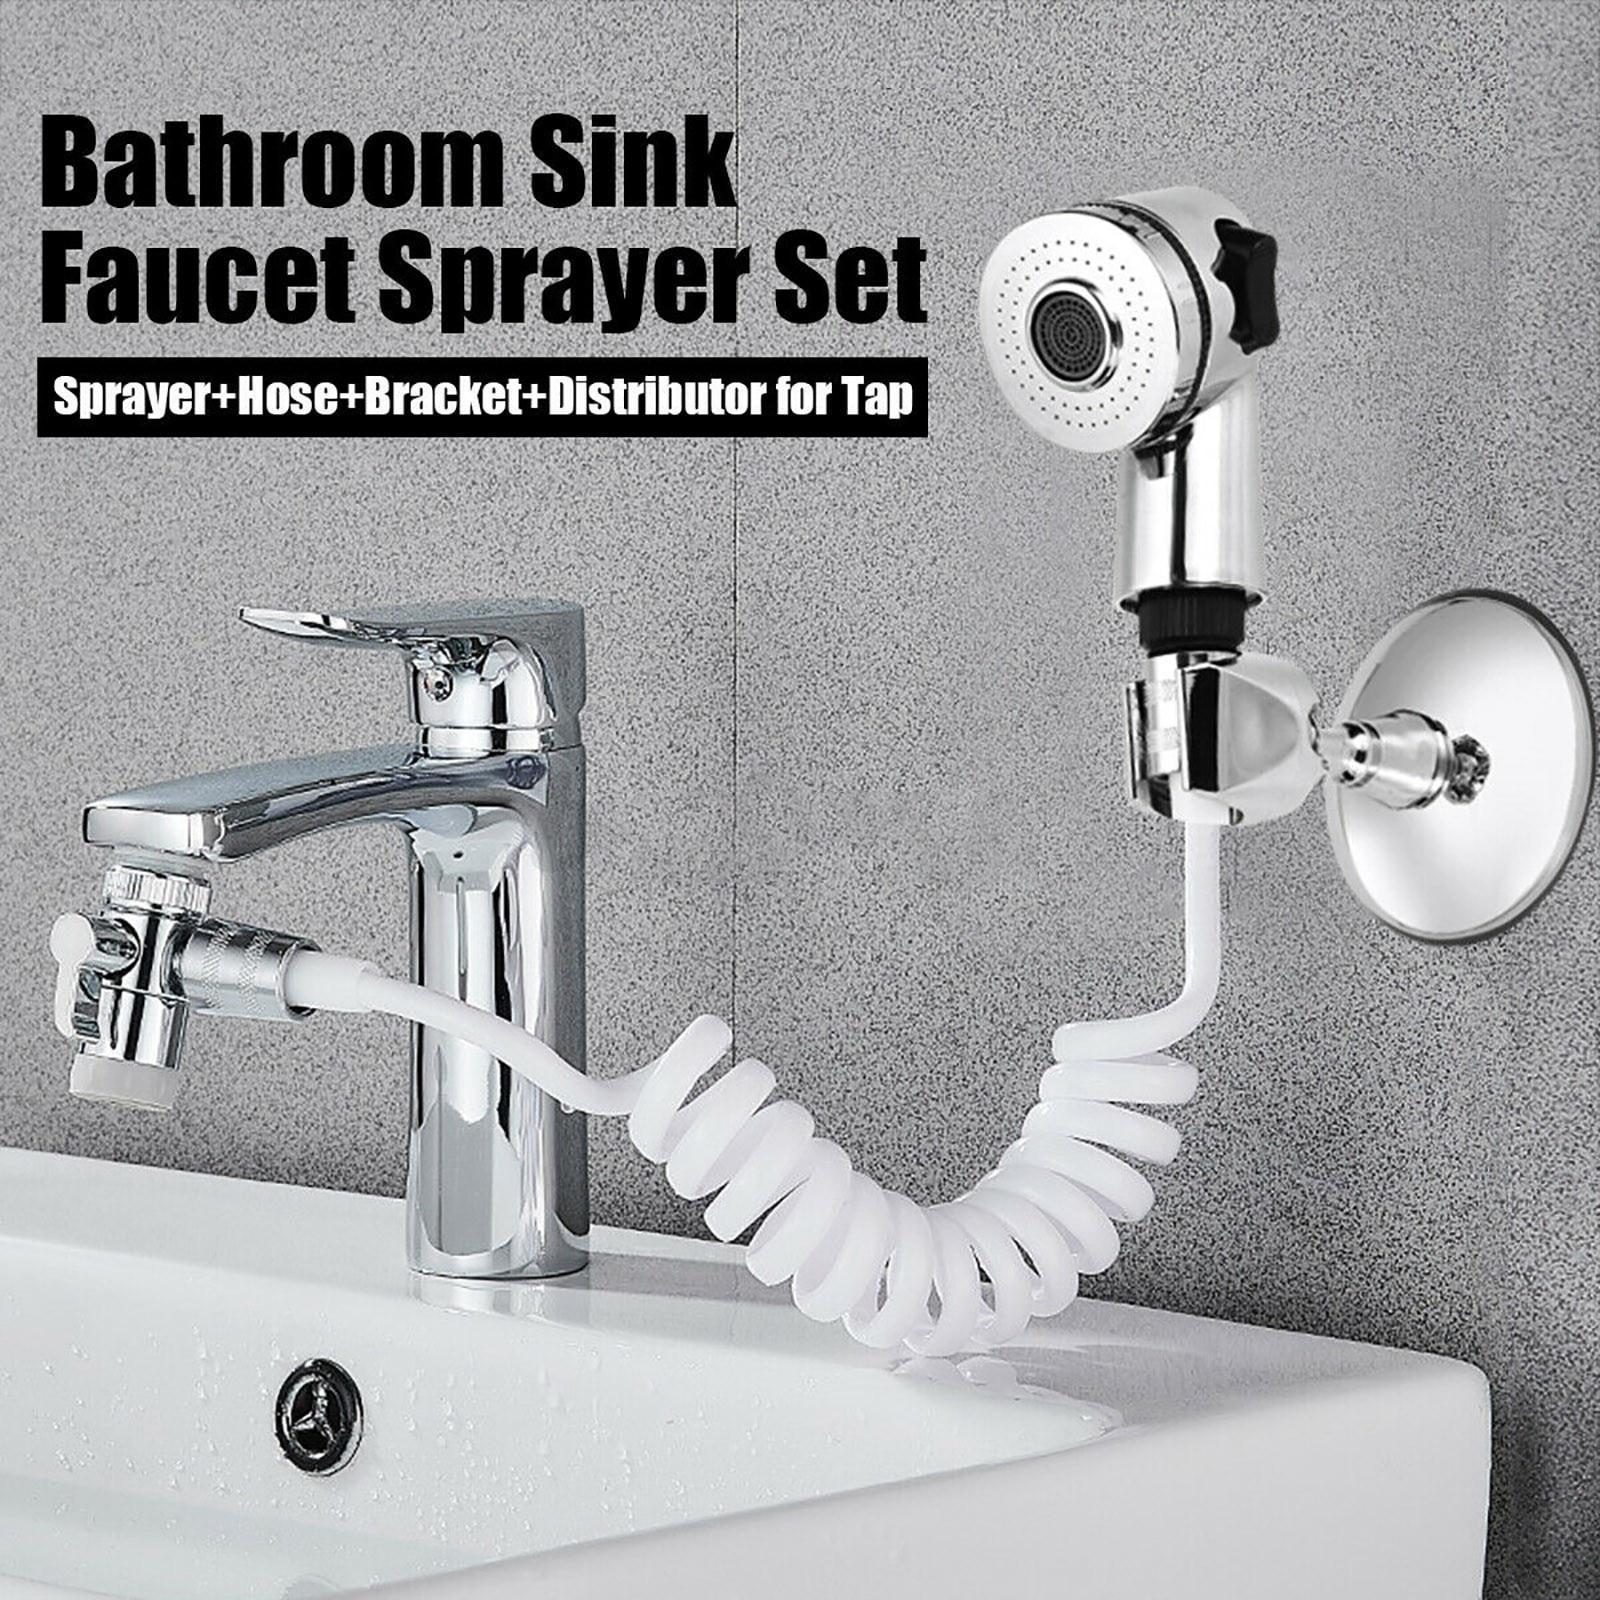 Haf2e09701e984c8d9d4f37ffbedf8978c Sink Tap Faucet Kitchens Shampoo Shower Heads Bathroom Spray Drain Filter Hose For Household Bathroom Accessories